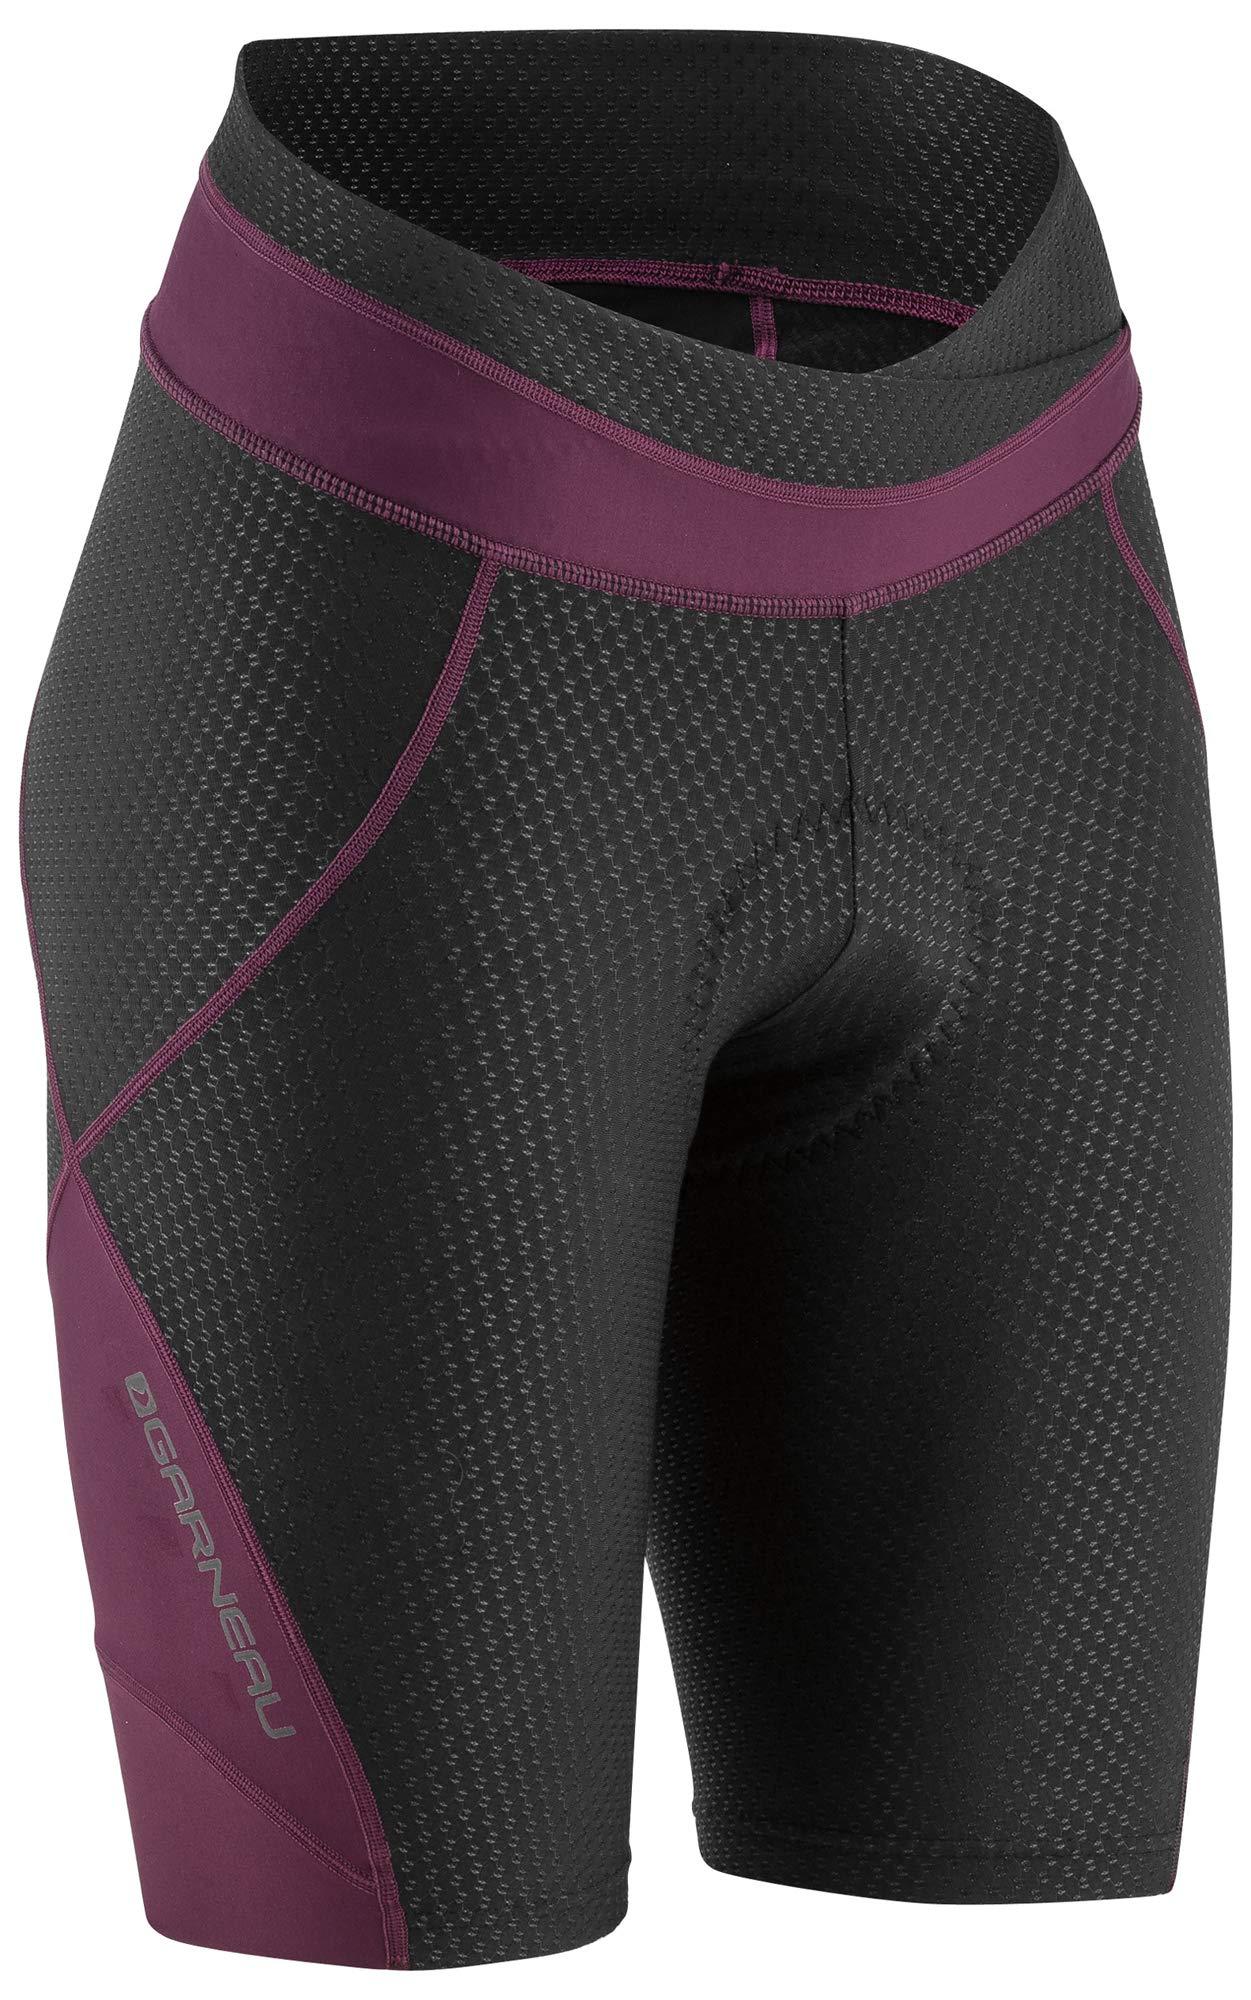 Louis Garneau Women's CB Carbon 2 Padded, Compression, Performance Bike Shorts, Black/Purple, Medium